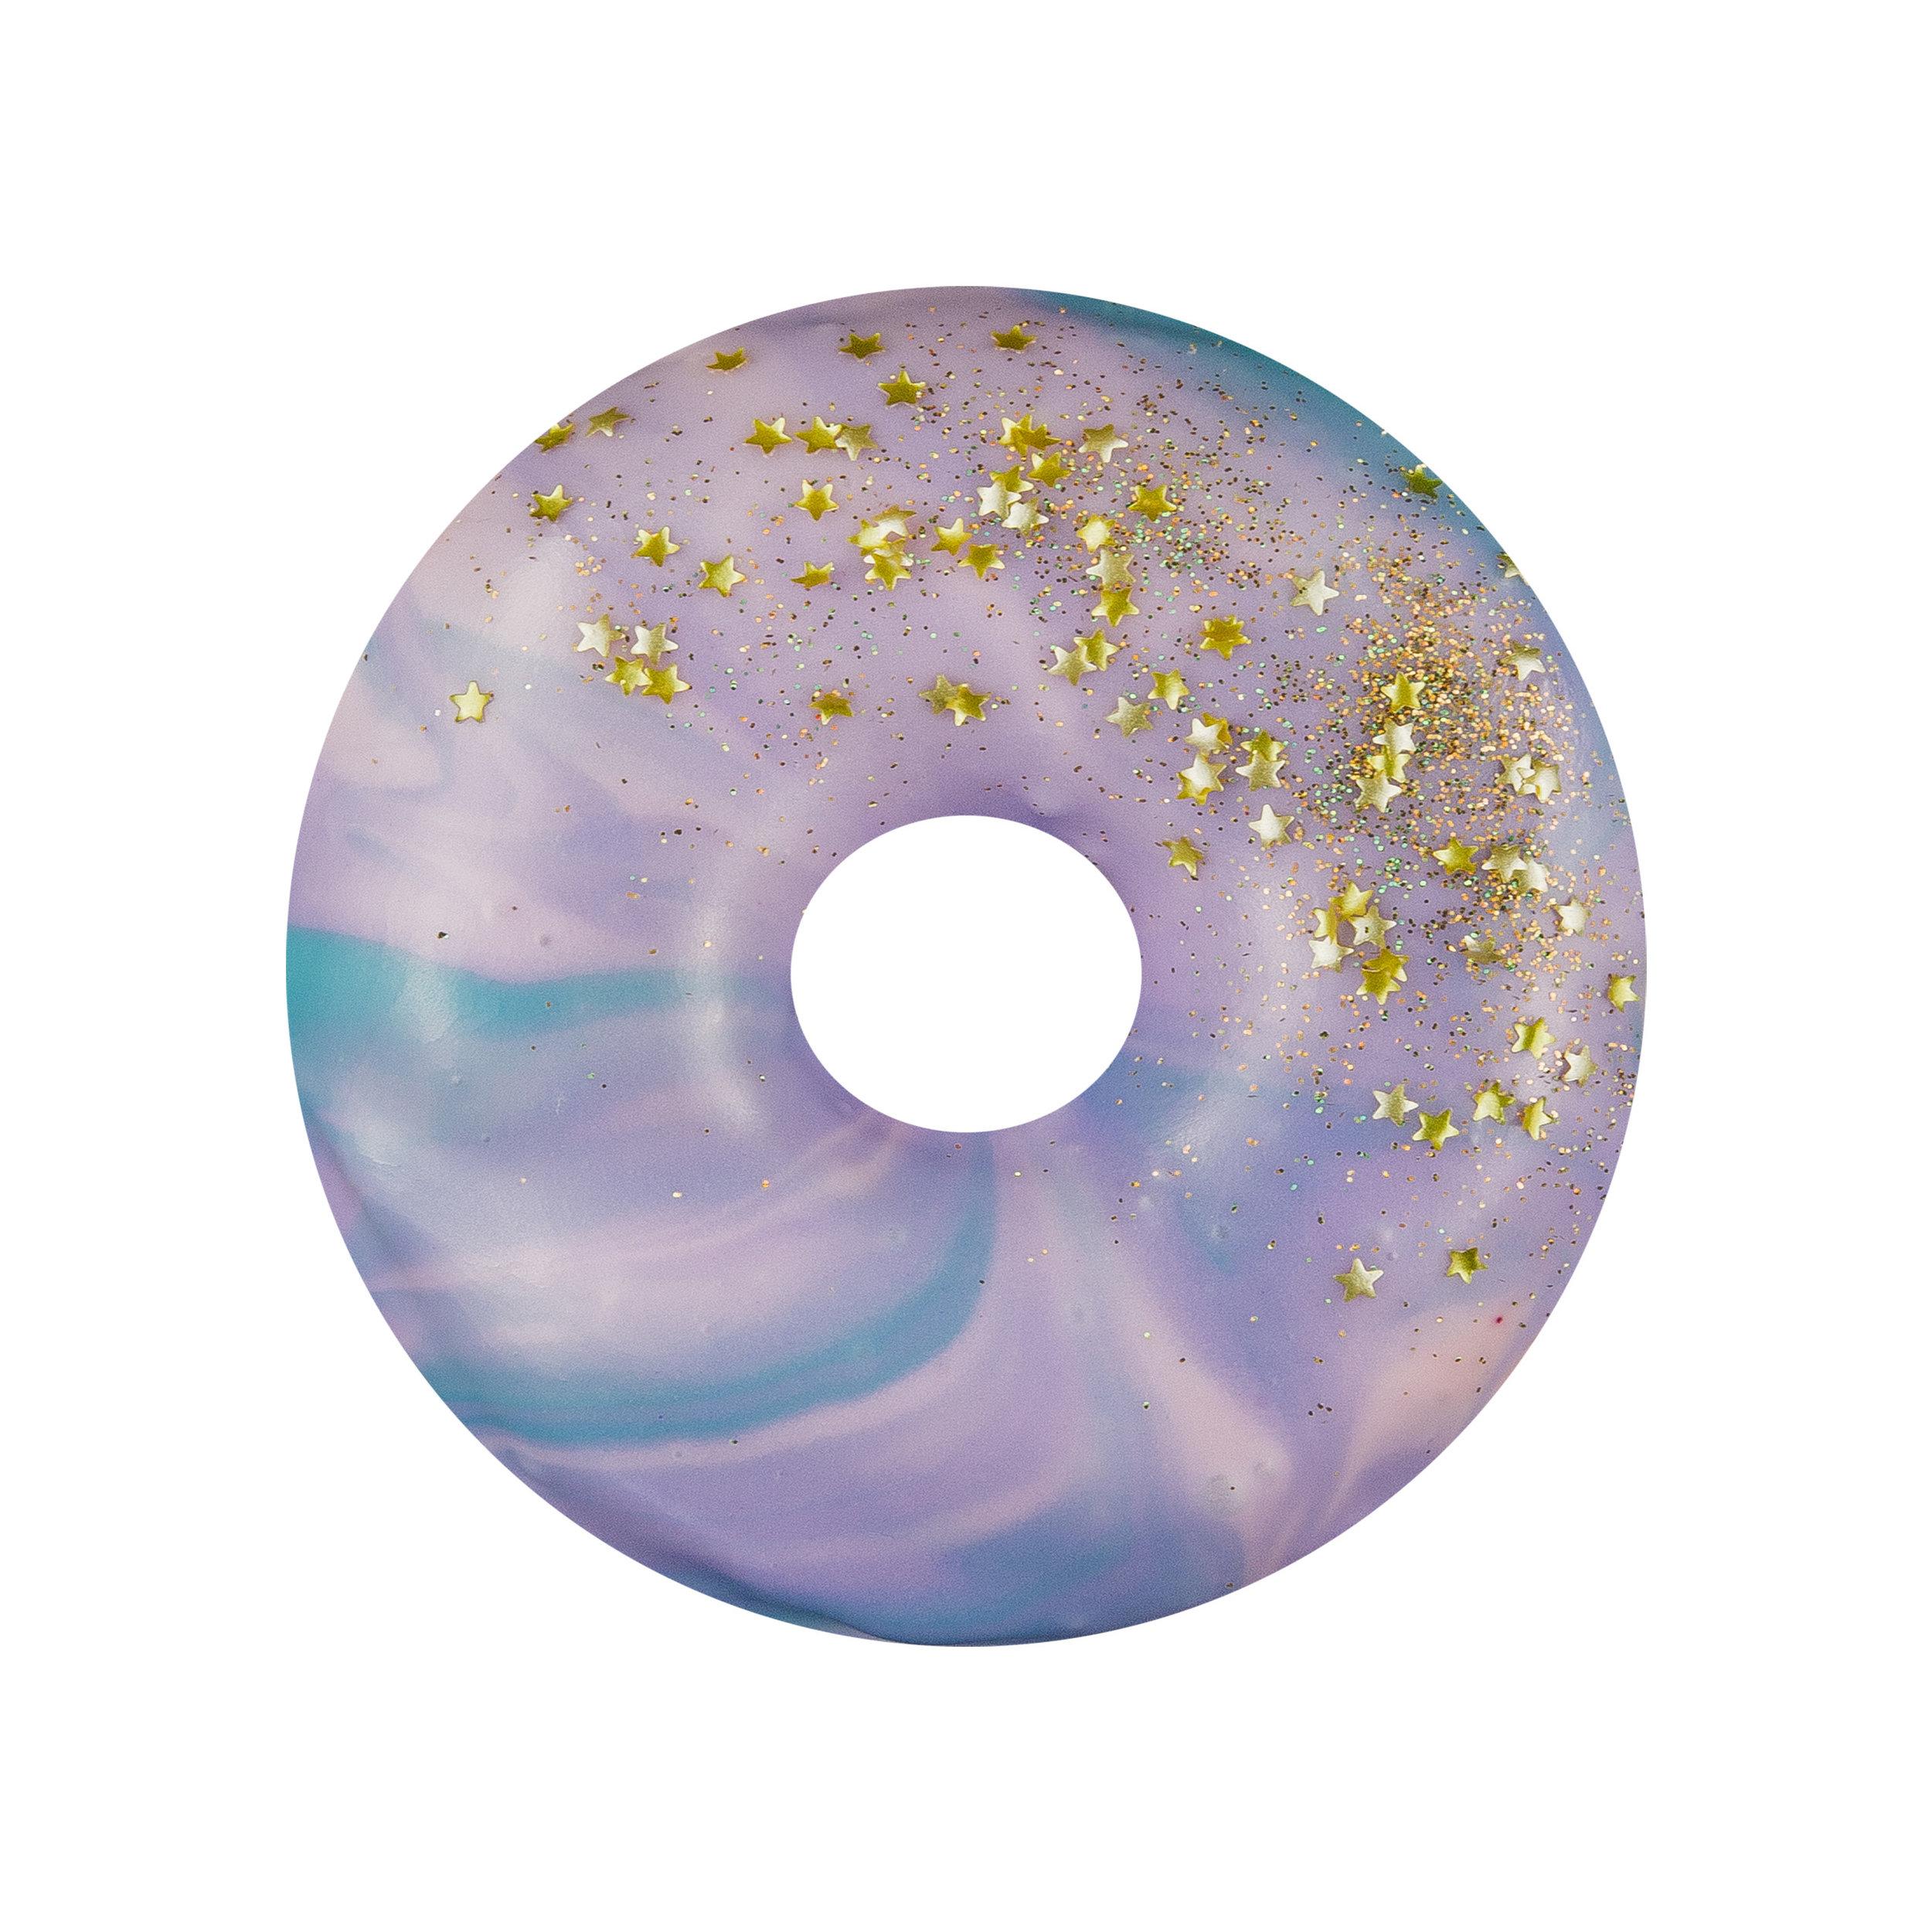 PASTEL GALAXY - VANILLA GALAXY GLAZE+ SPRINKLES